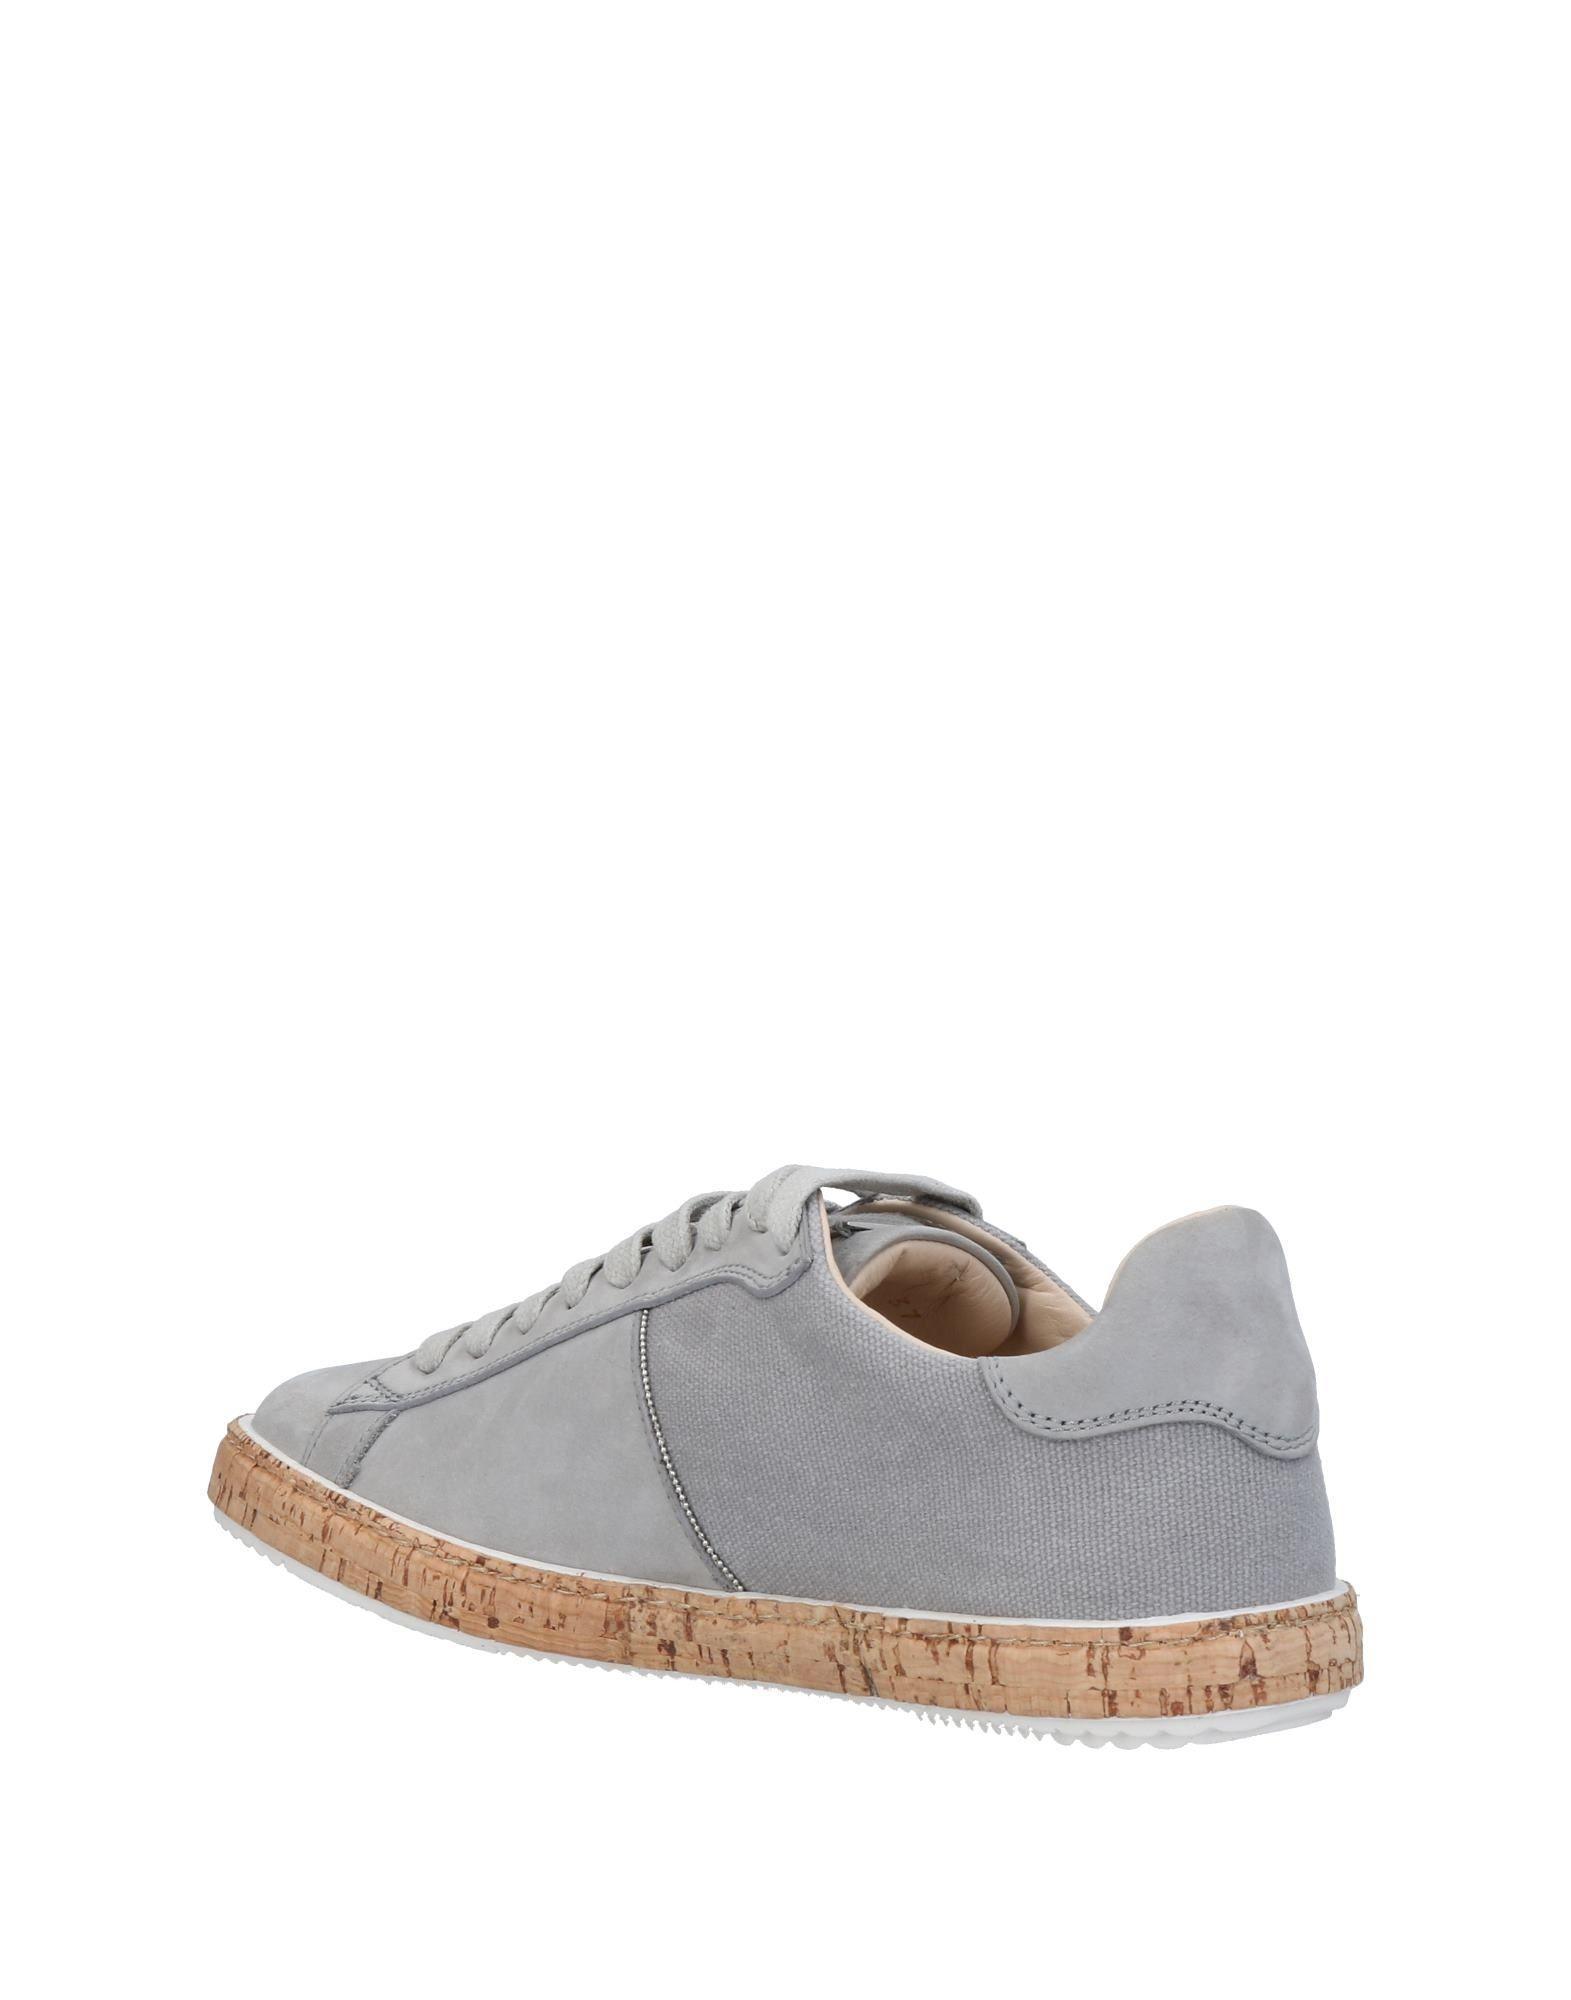 Fabiana Filippi Canvas Low-tops & Sneakers in Light Grey (Grey)